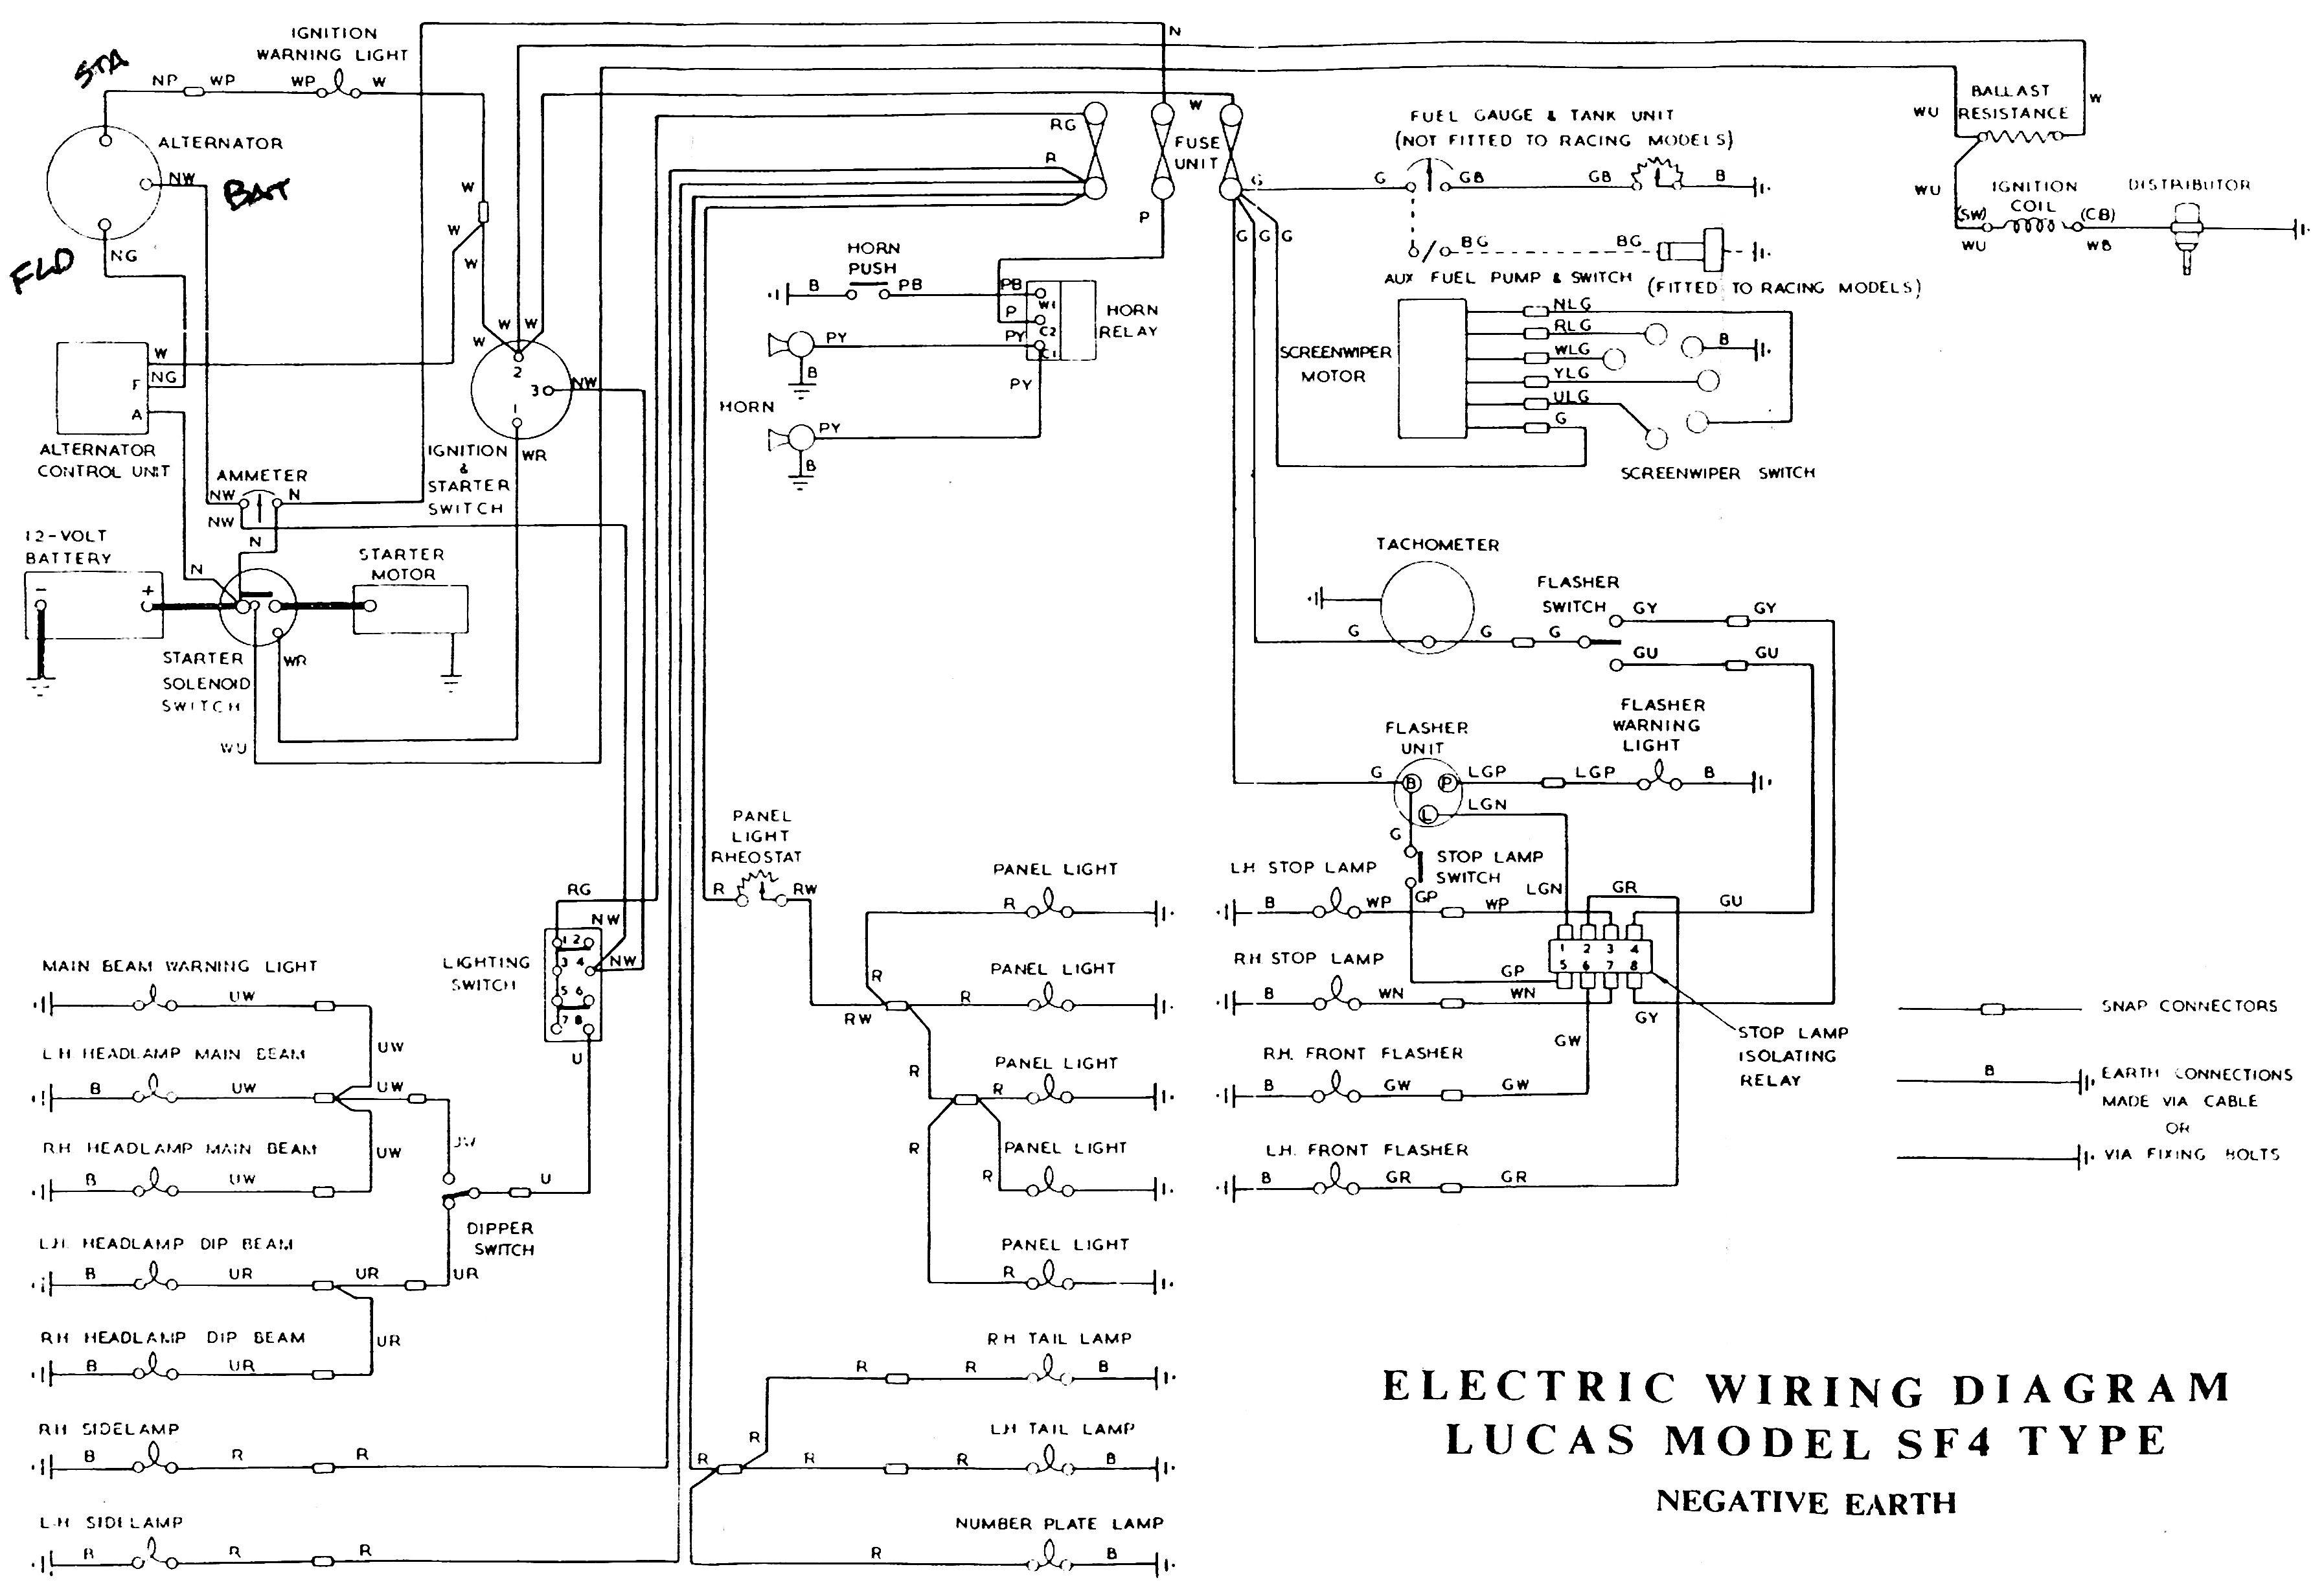 Diagram Omc Cobra Engine Wiring Diagram Full Version Hd Quality Wiring Diagram Ezplugwiringk Queidue It